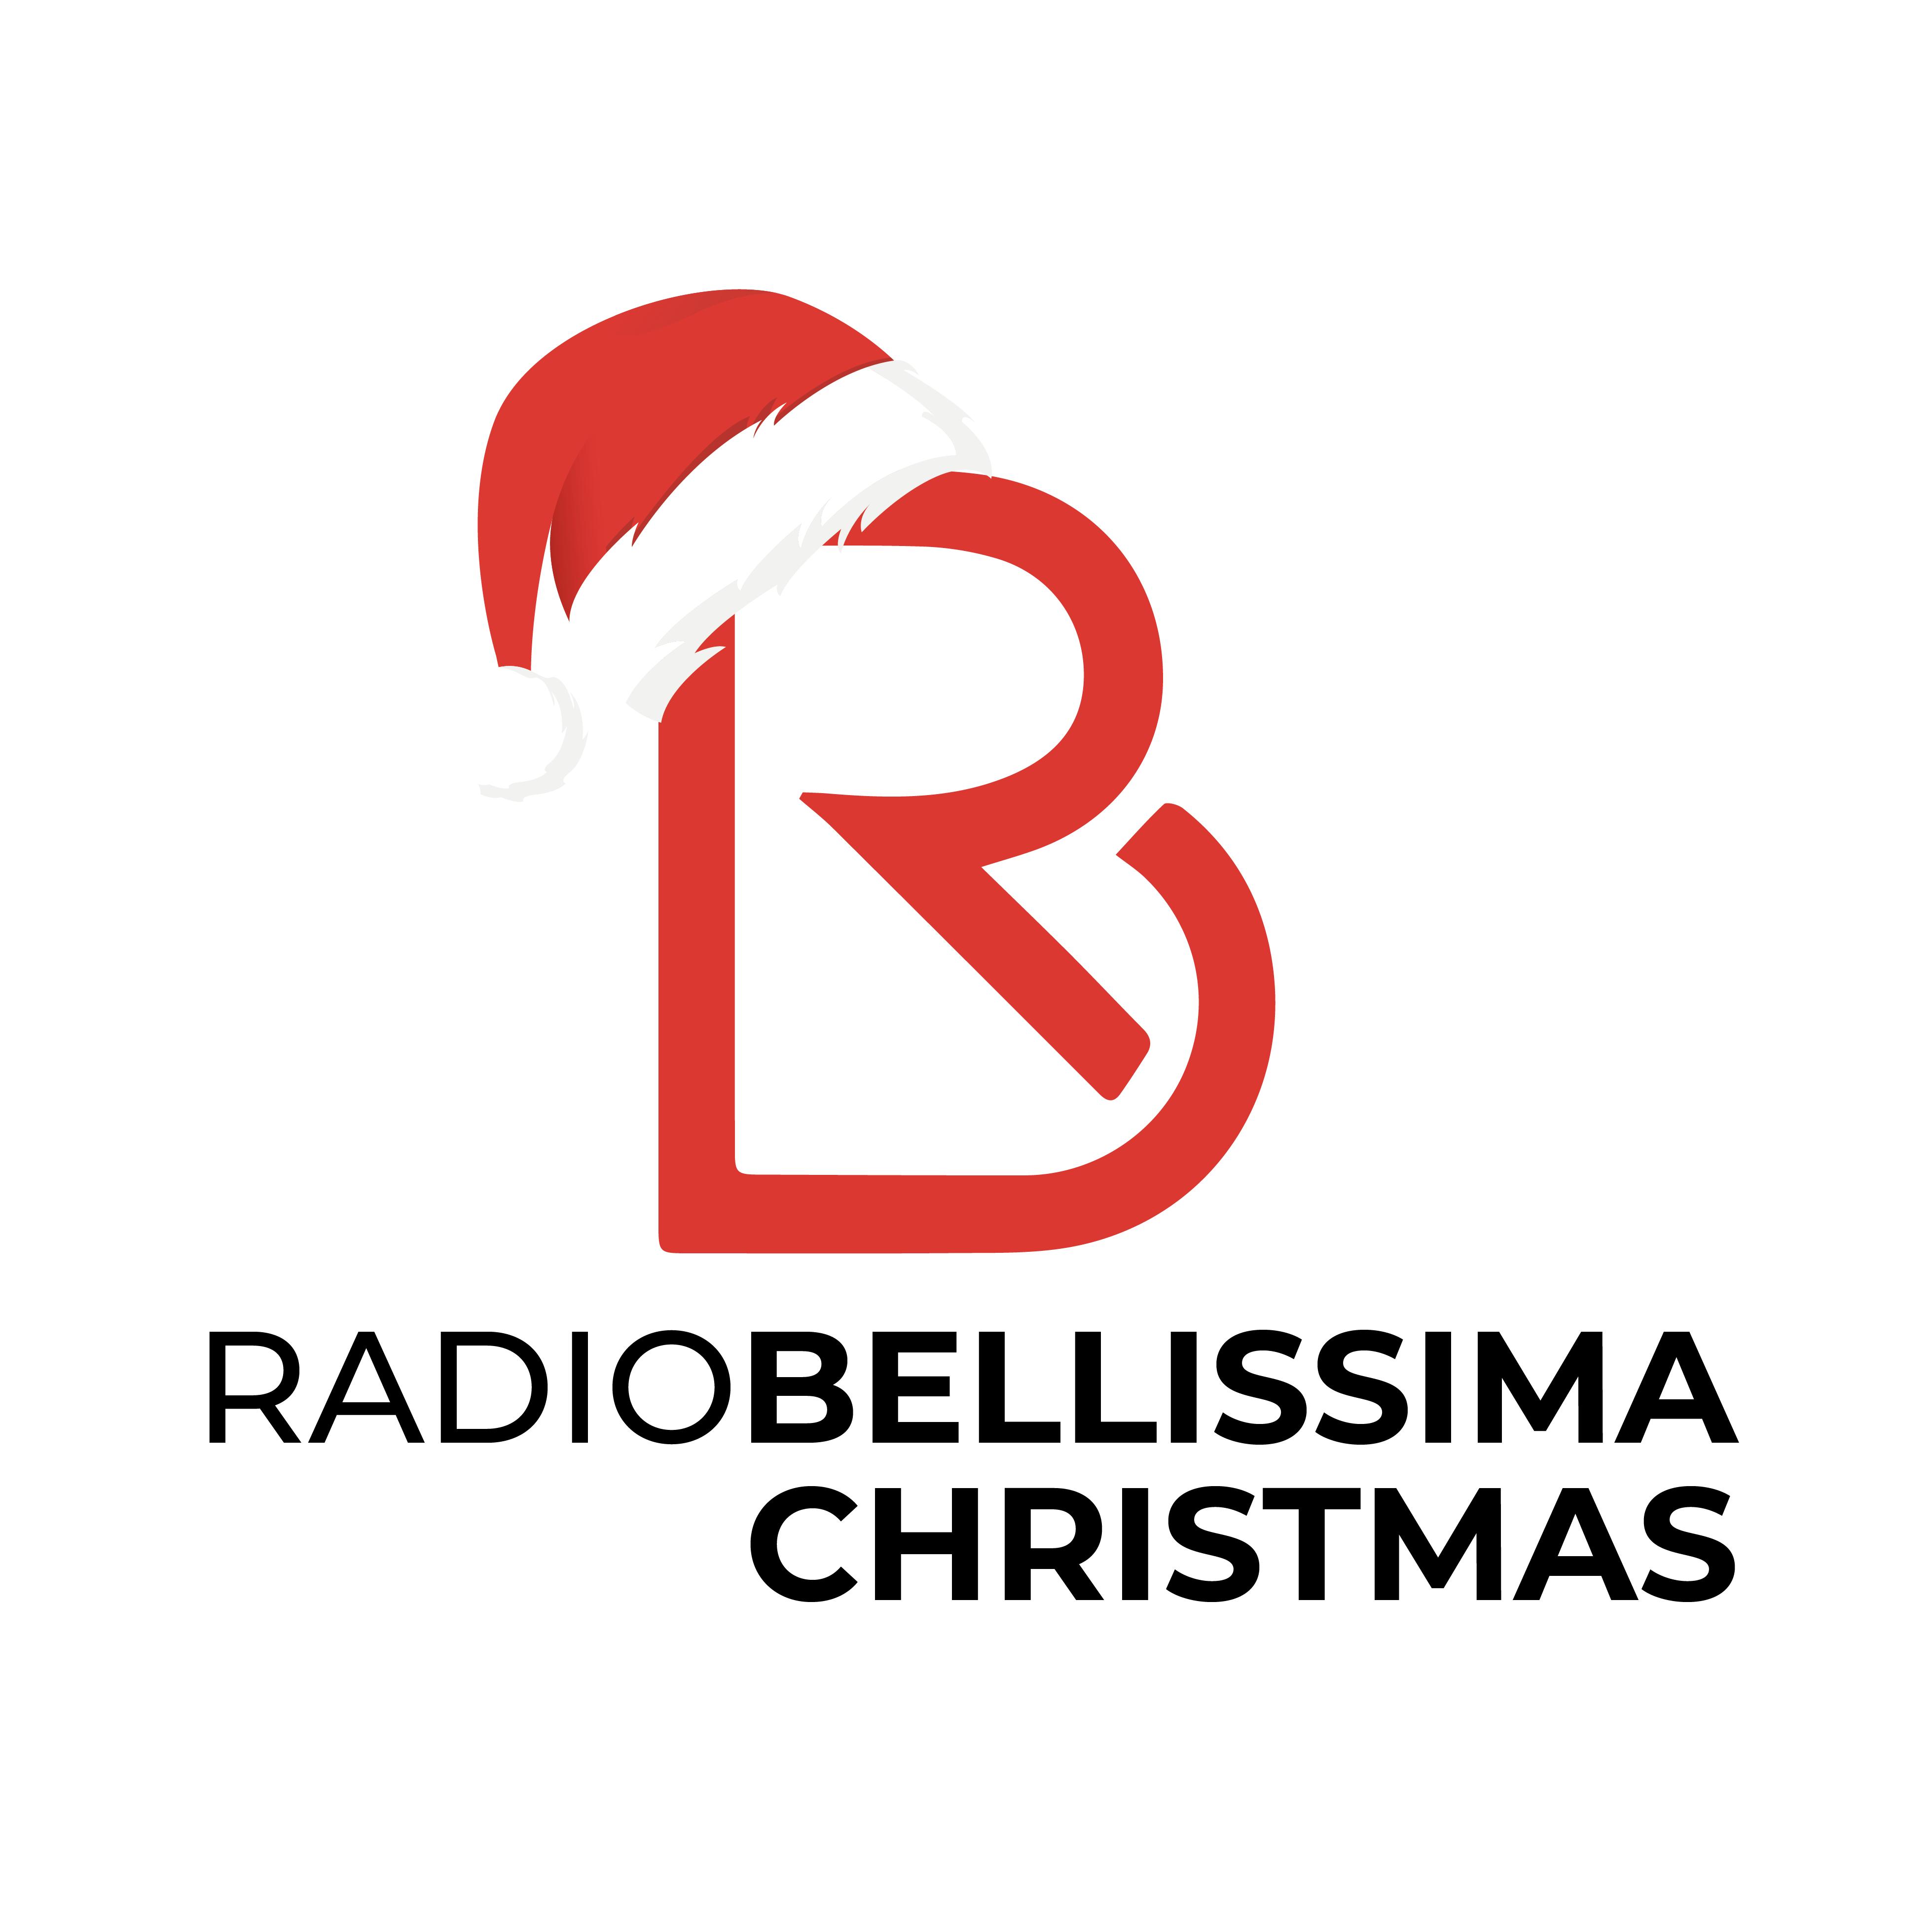 Bellissima Christmas